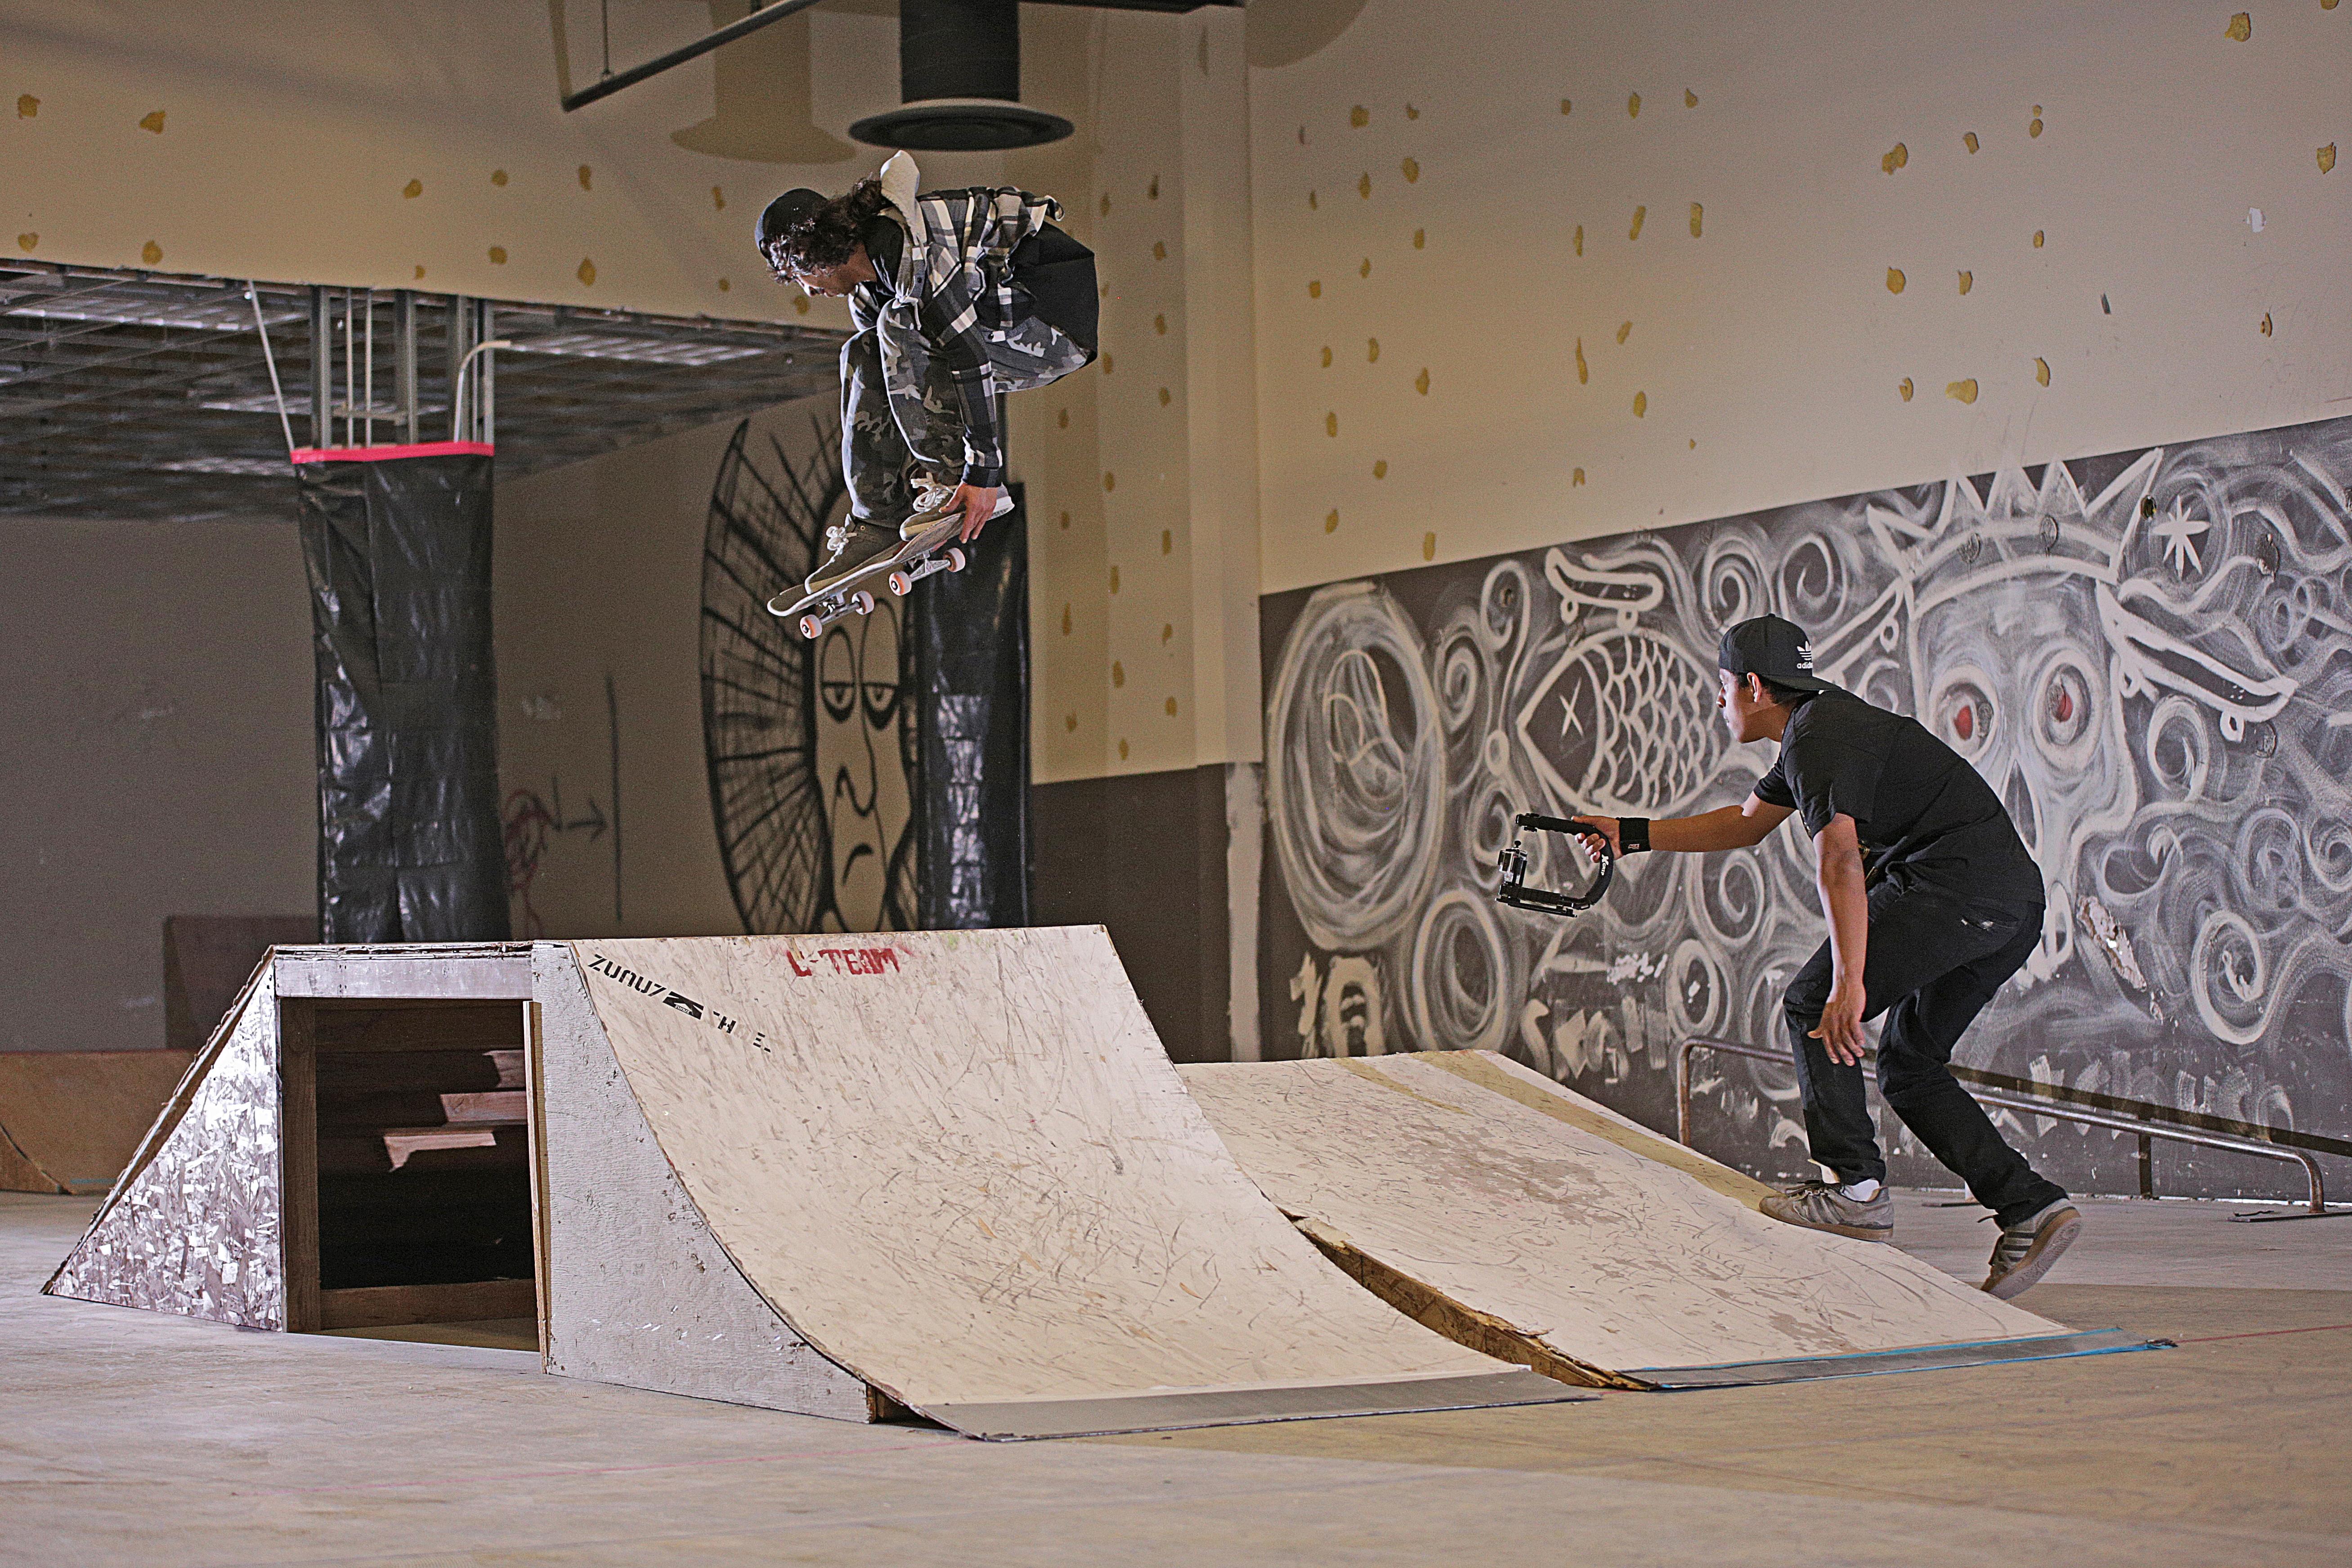 George Vargas tail grap transfer at Skate Church photo Volland